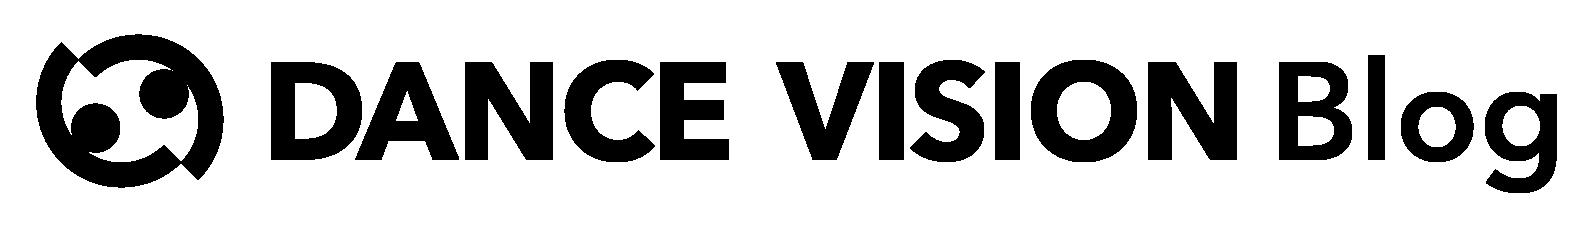 Dance Vision Blog Logo-02